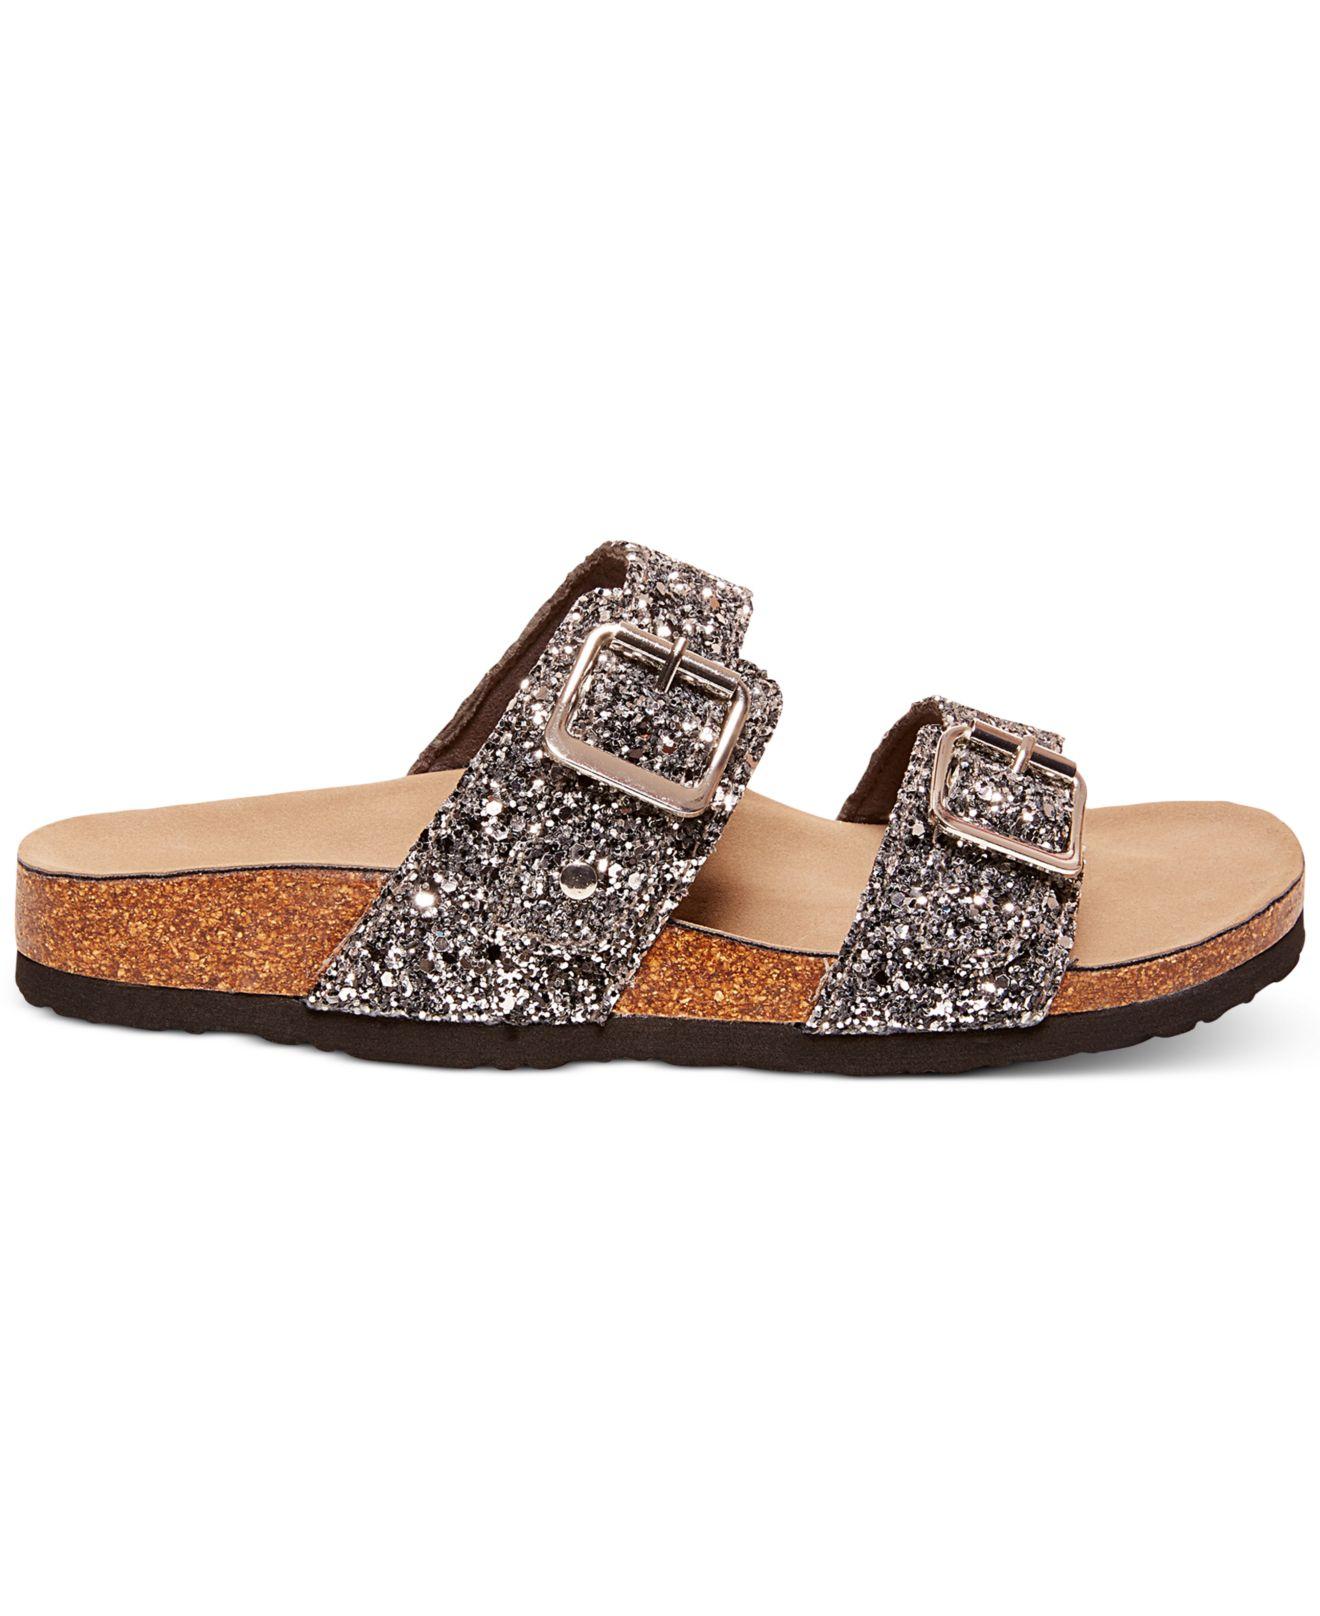 007e805eb5441 Lyst - Madden Girl Brando Glitter Faux-Leather Sandals in Metallic